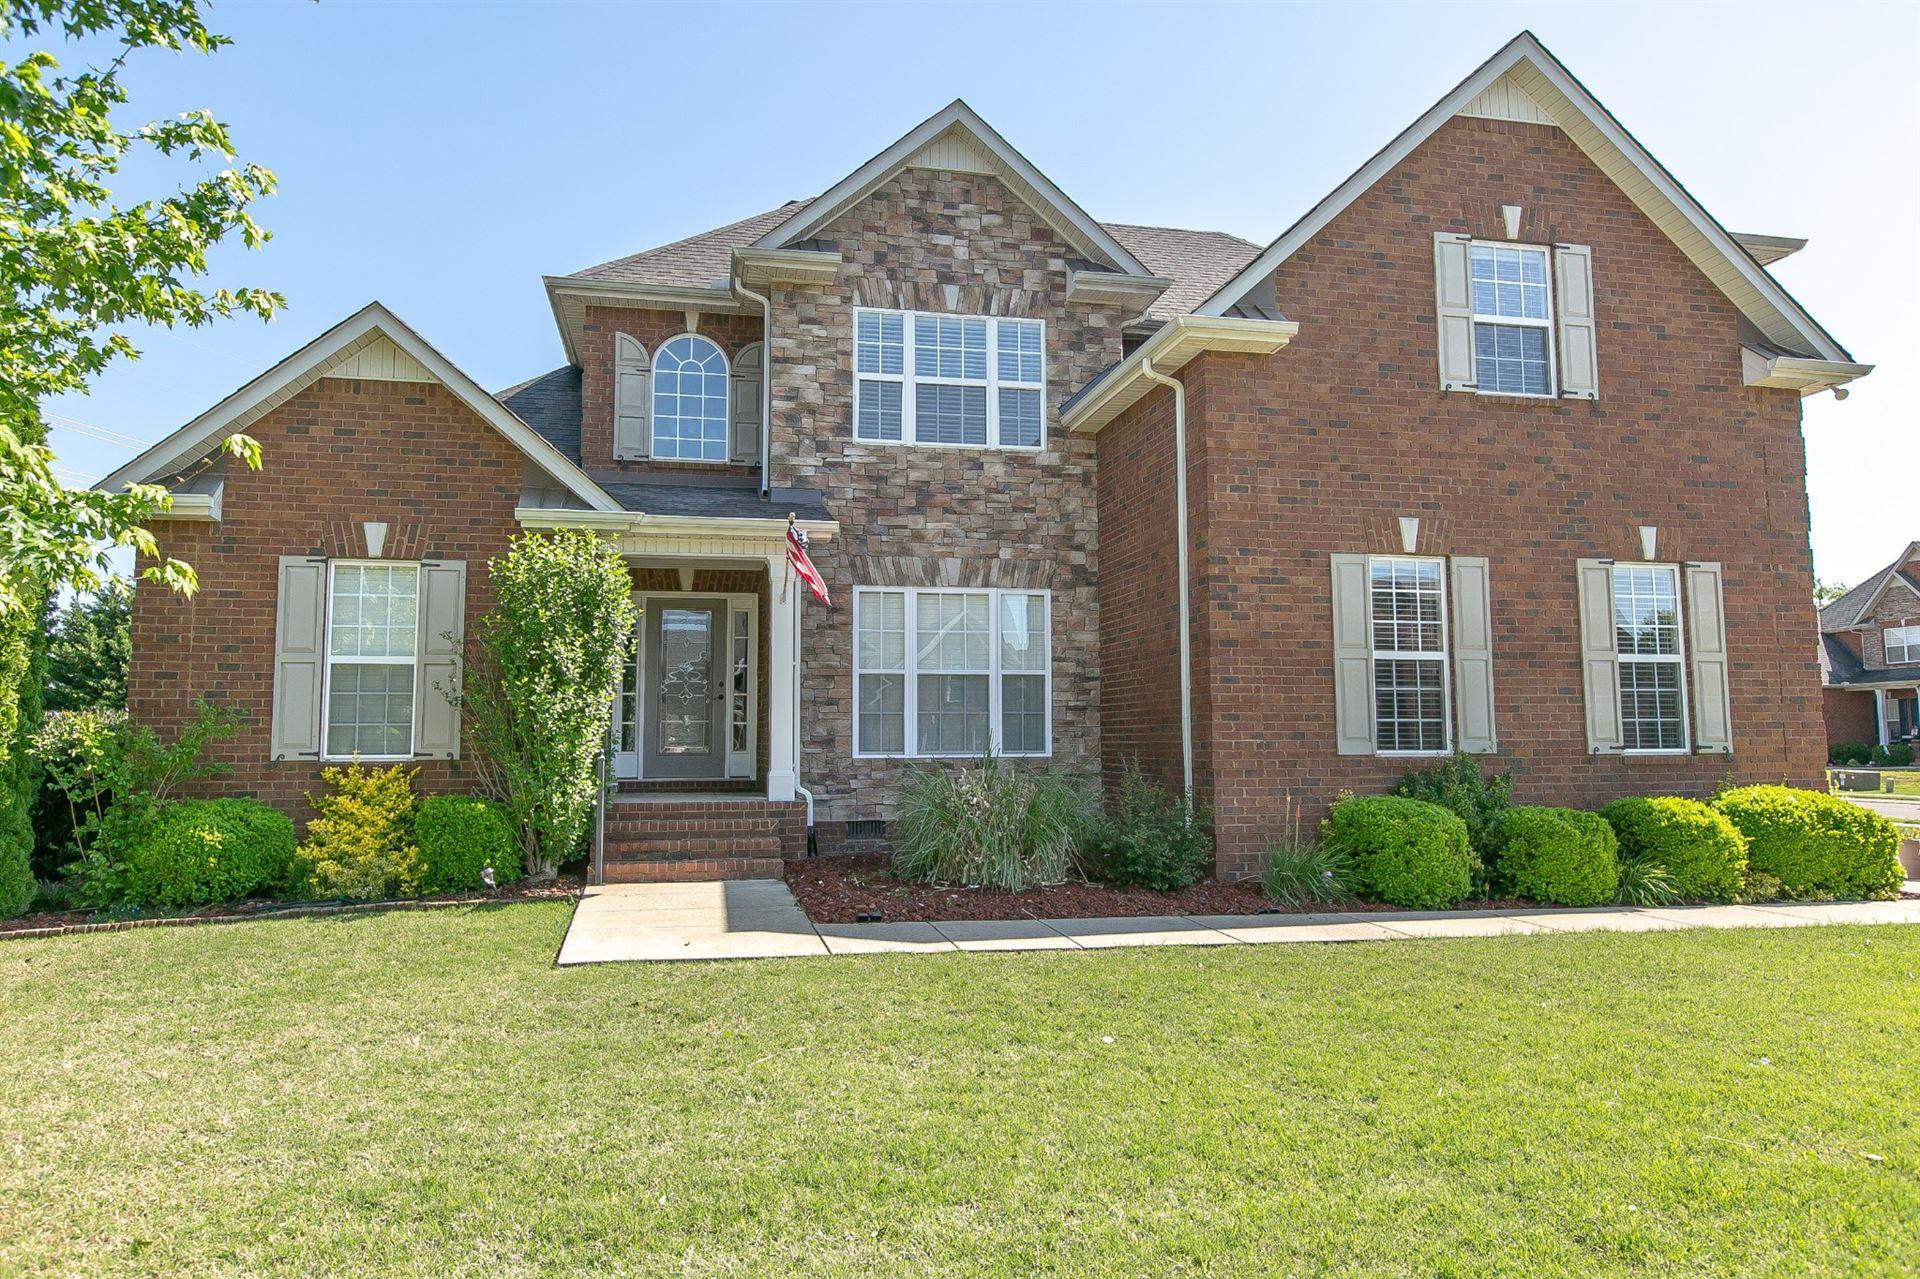 Photo of 2733 Presley Drive, Murfreesboro, TN 37128 (MLS # 2251564)